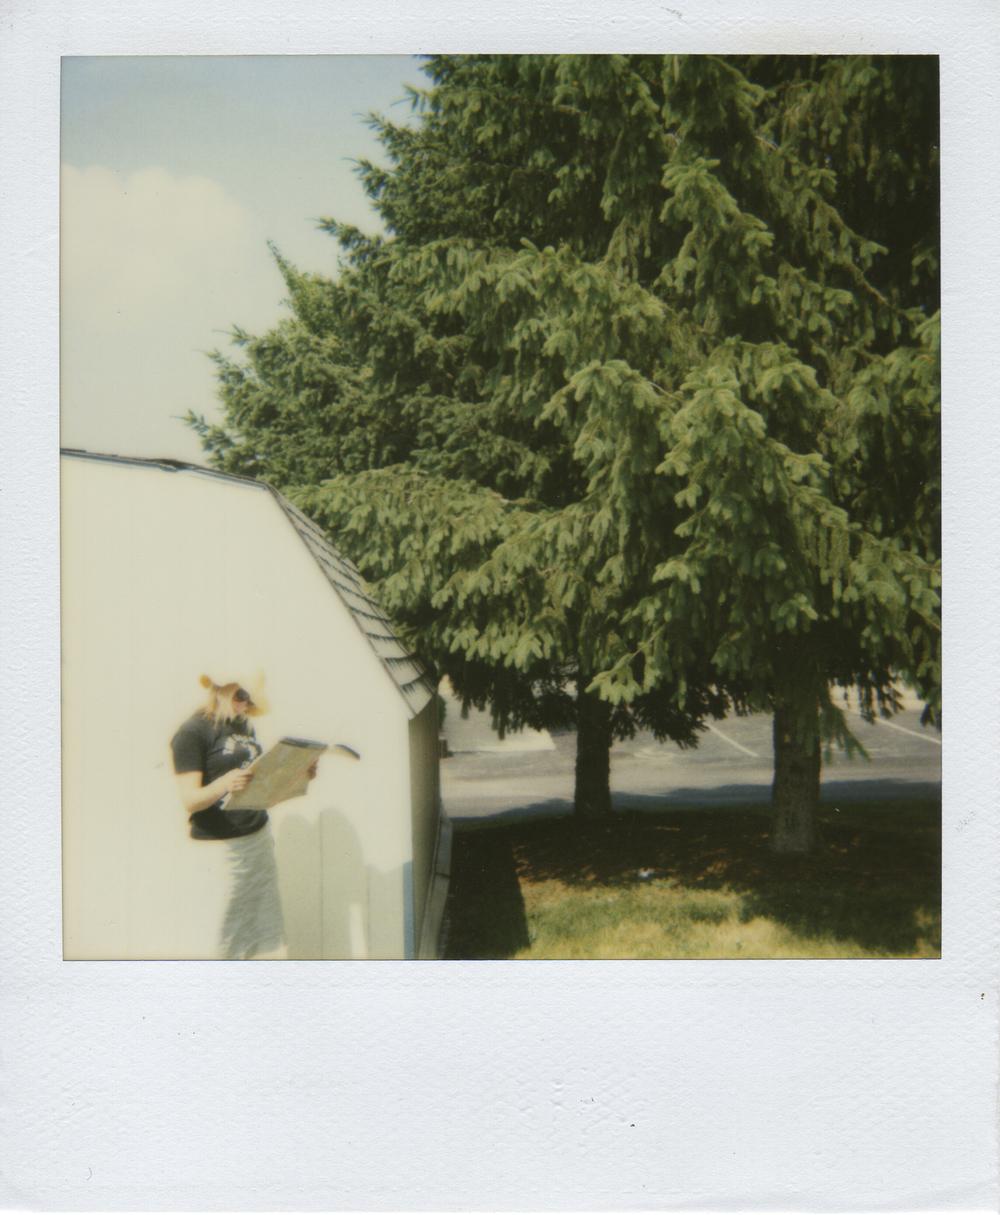 jlaurence-polaroid-005.jpg